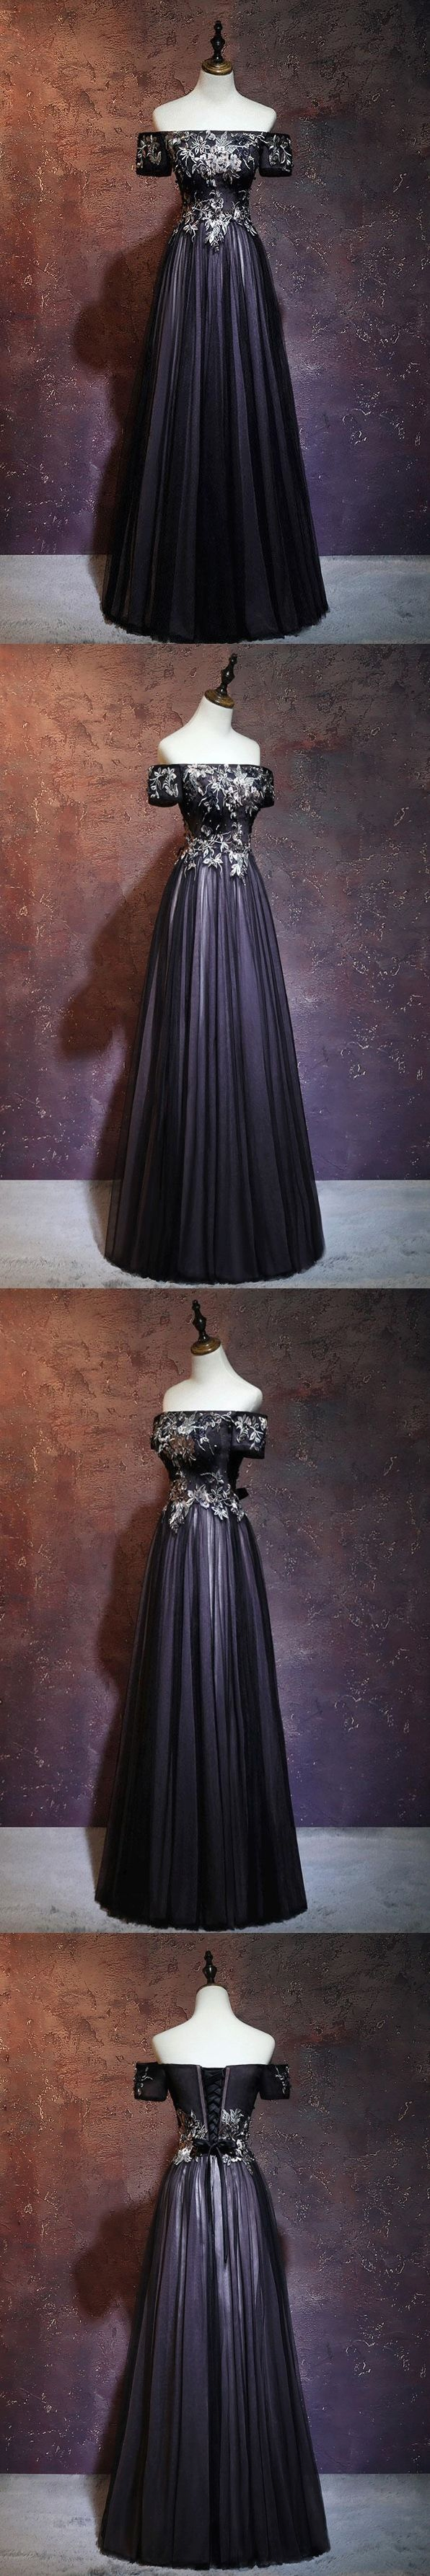 best dresses and fancy images on pinterest bridesmaids